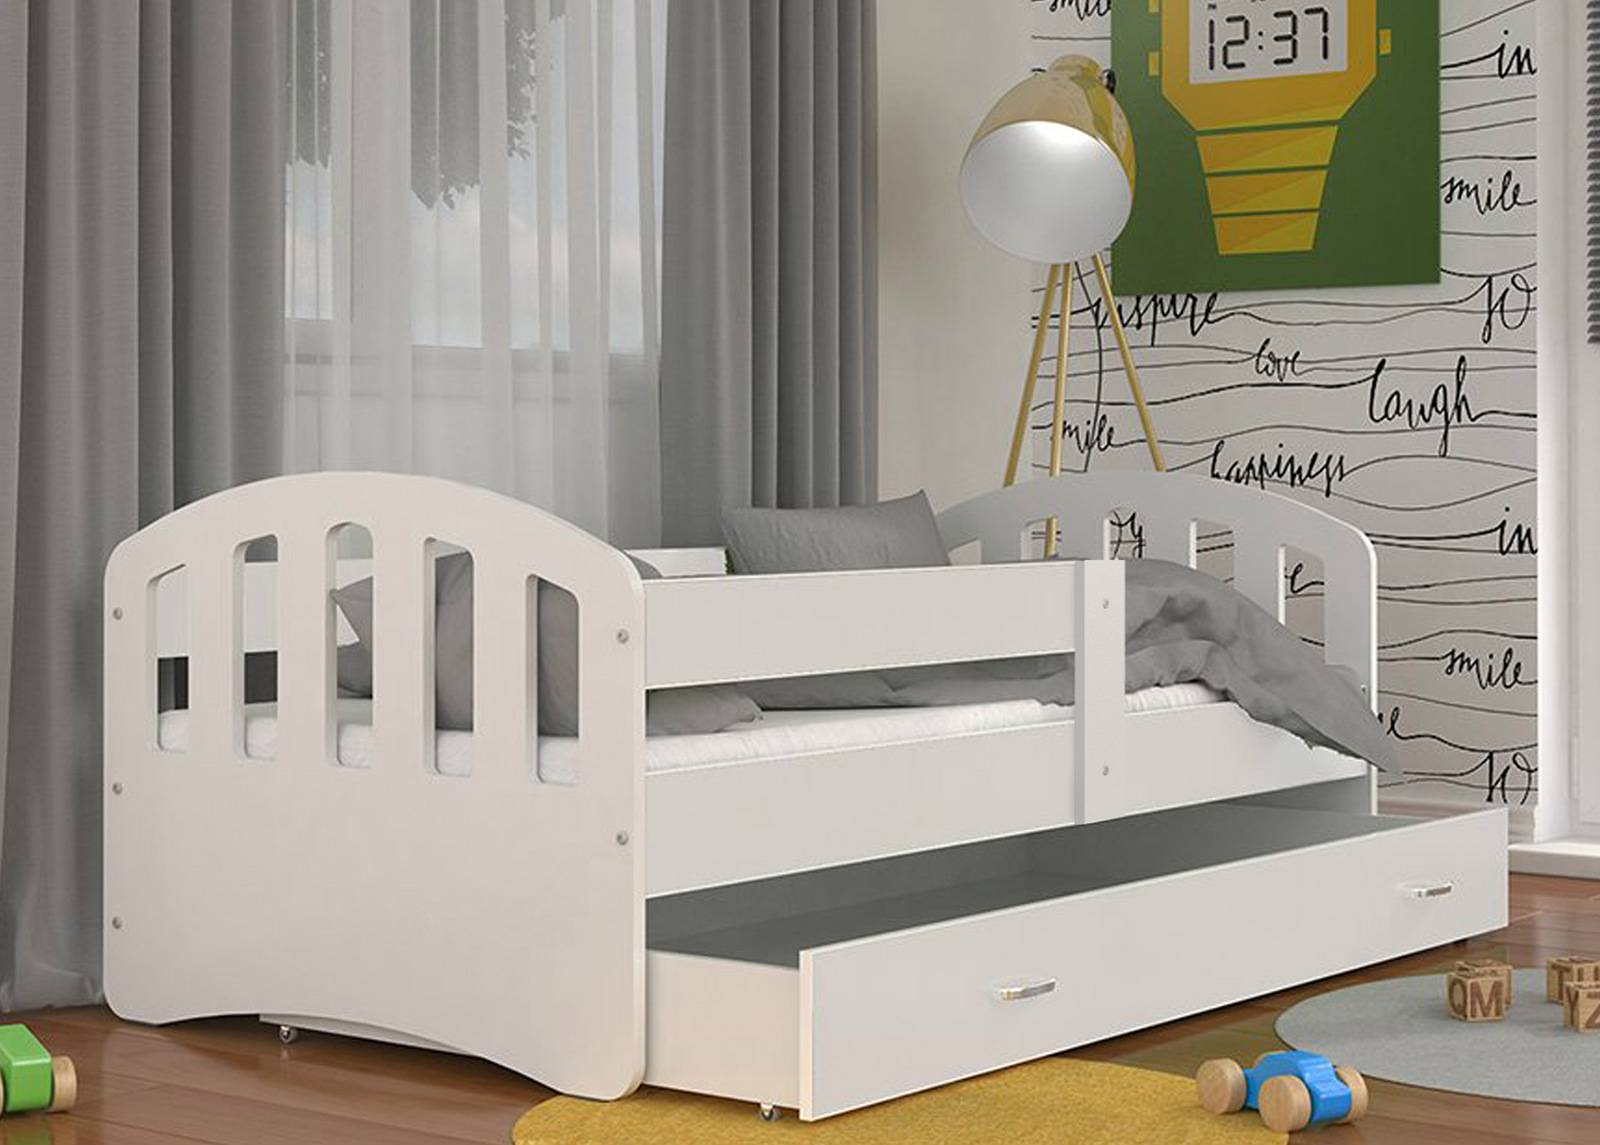 AJK-Meble Lastensänky vuodevaatelaatikolla 80x160 cm + patja